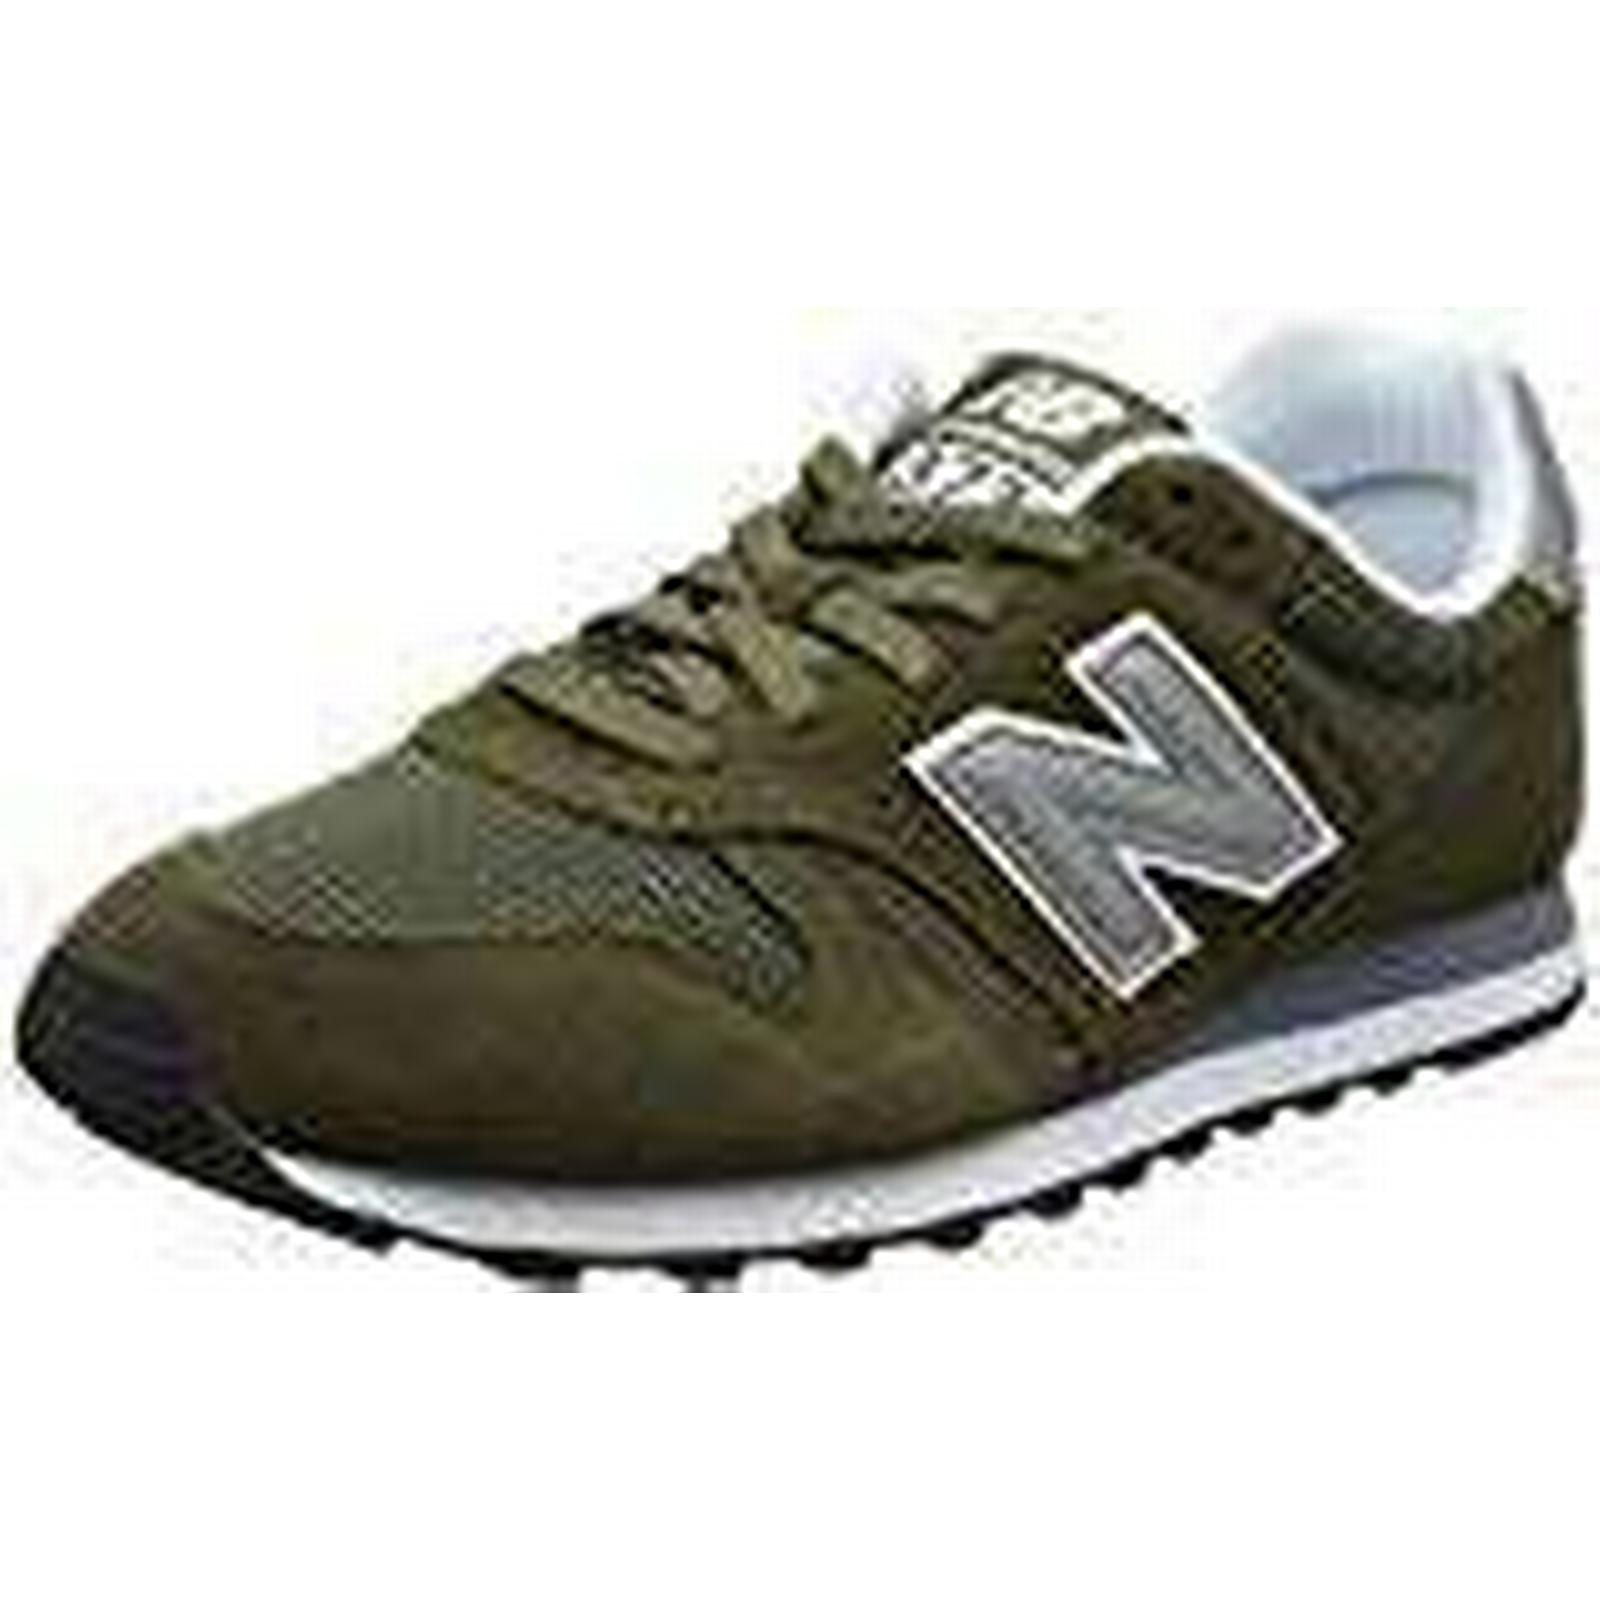 New Balance Men's UK Ml373V1 Trainers, Green (Olive/Silver Olv), 8 UK Men's 42 EU 626115